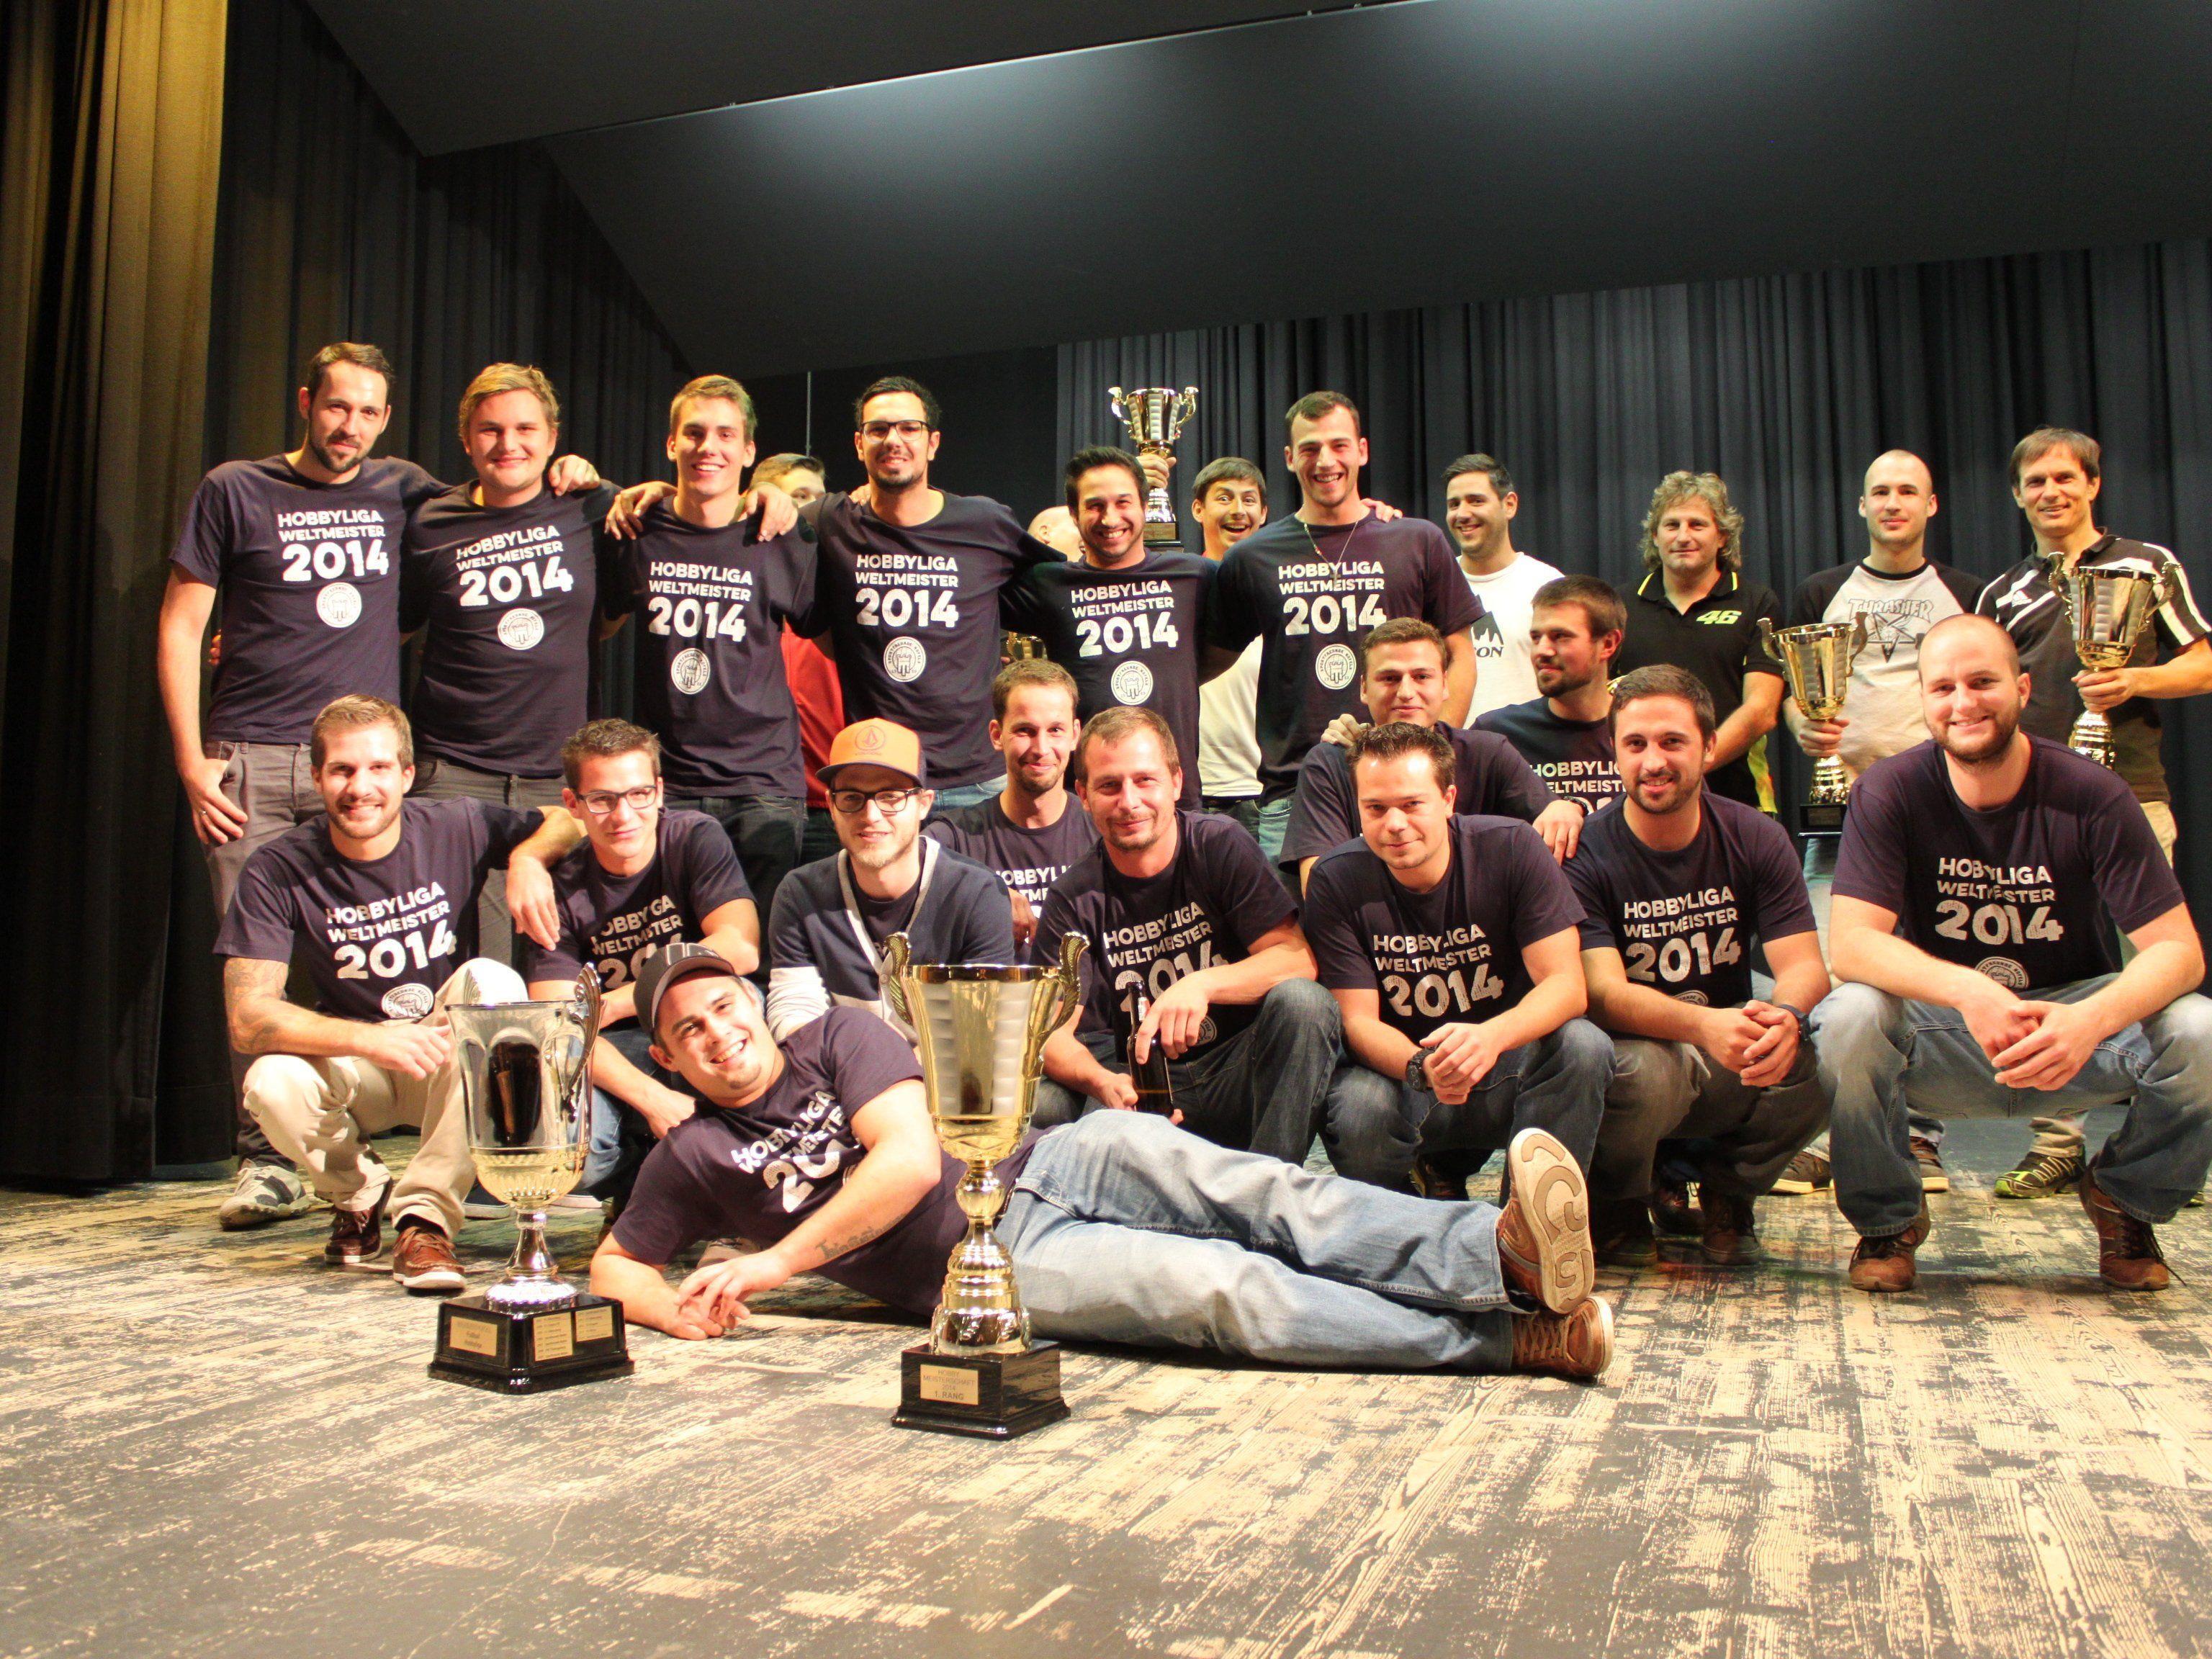 Verdienter Hobbyliga-Meister 2014: Sportfreunde Nofels